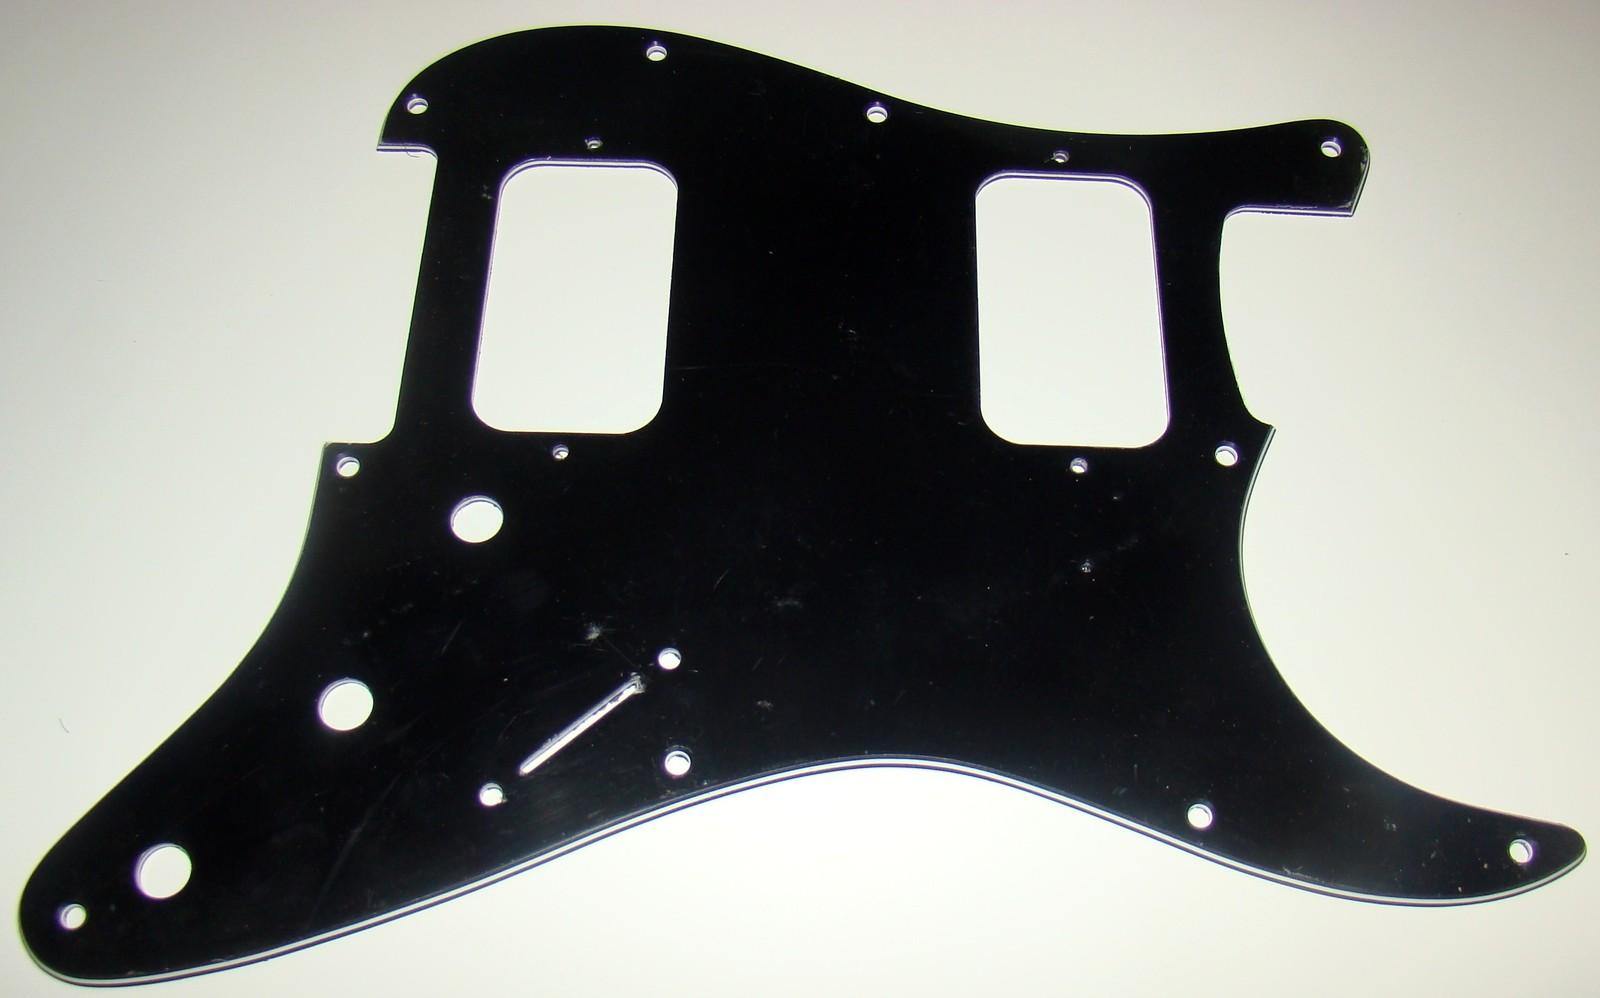 3 Ply Pickguard For Fender Stratocaster® For Two Humbuckers, Black/White/Black - $17.95 - $19.95